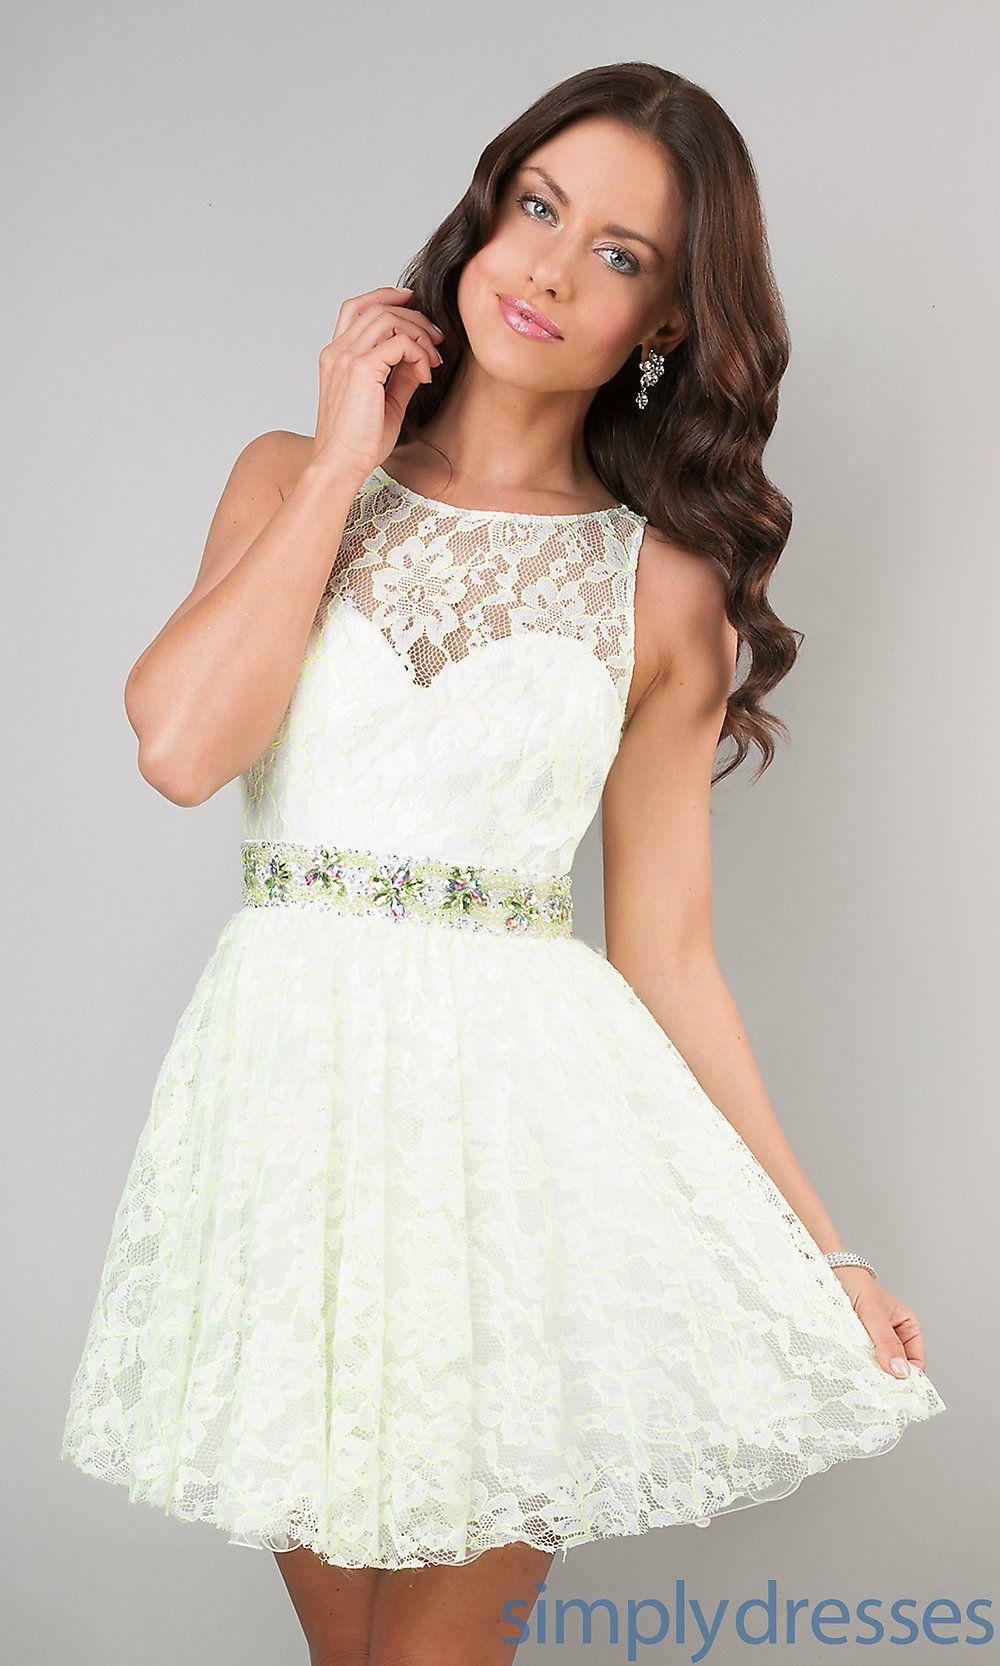 semi formal dresses for teenage girls Google Search pint